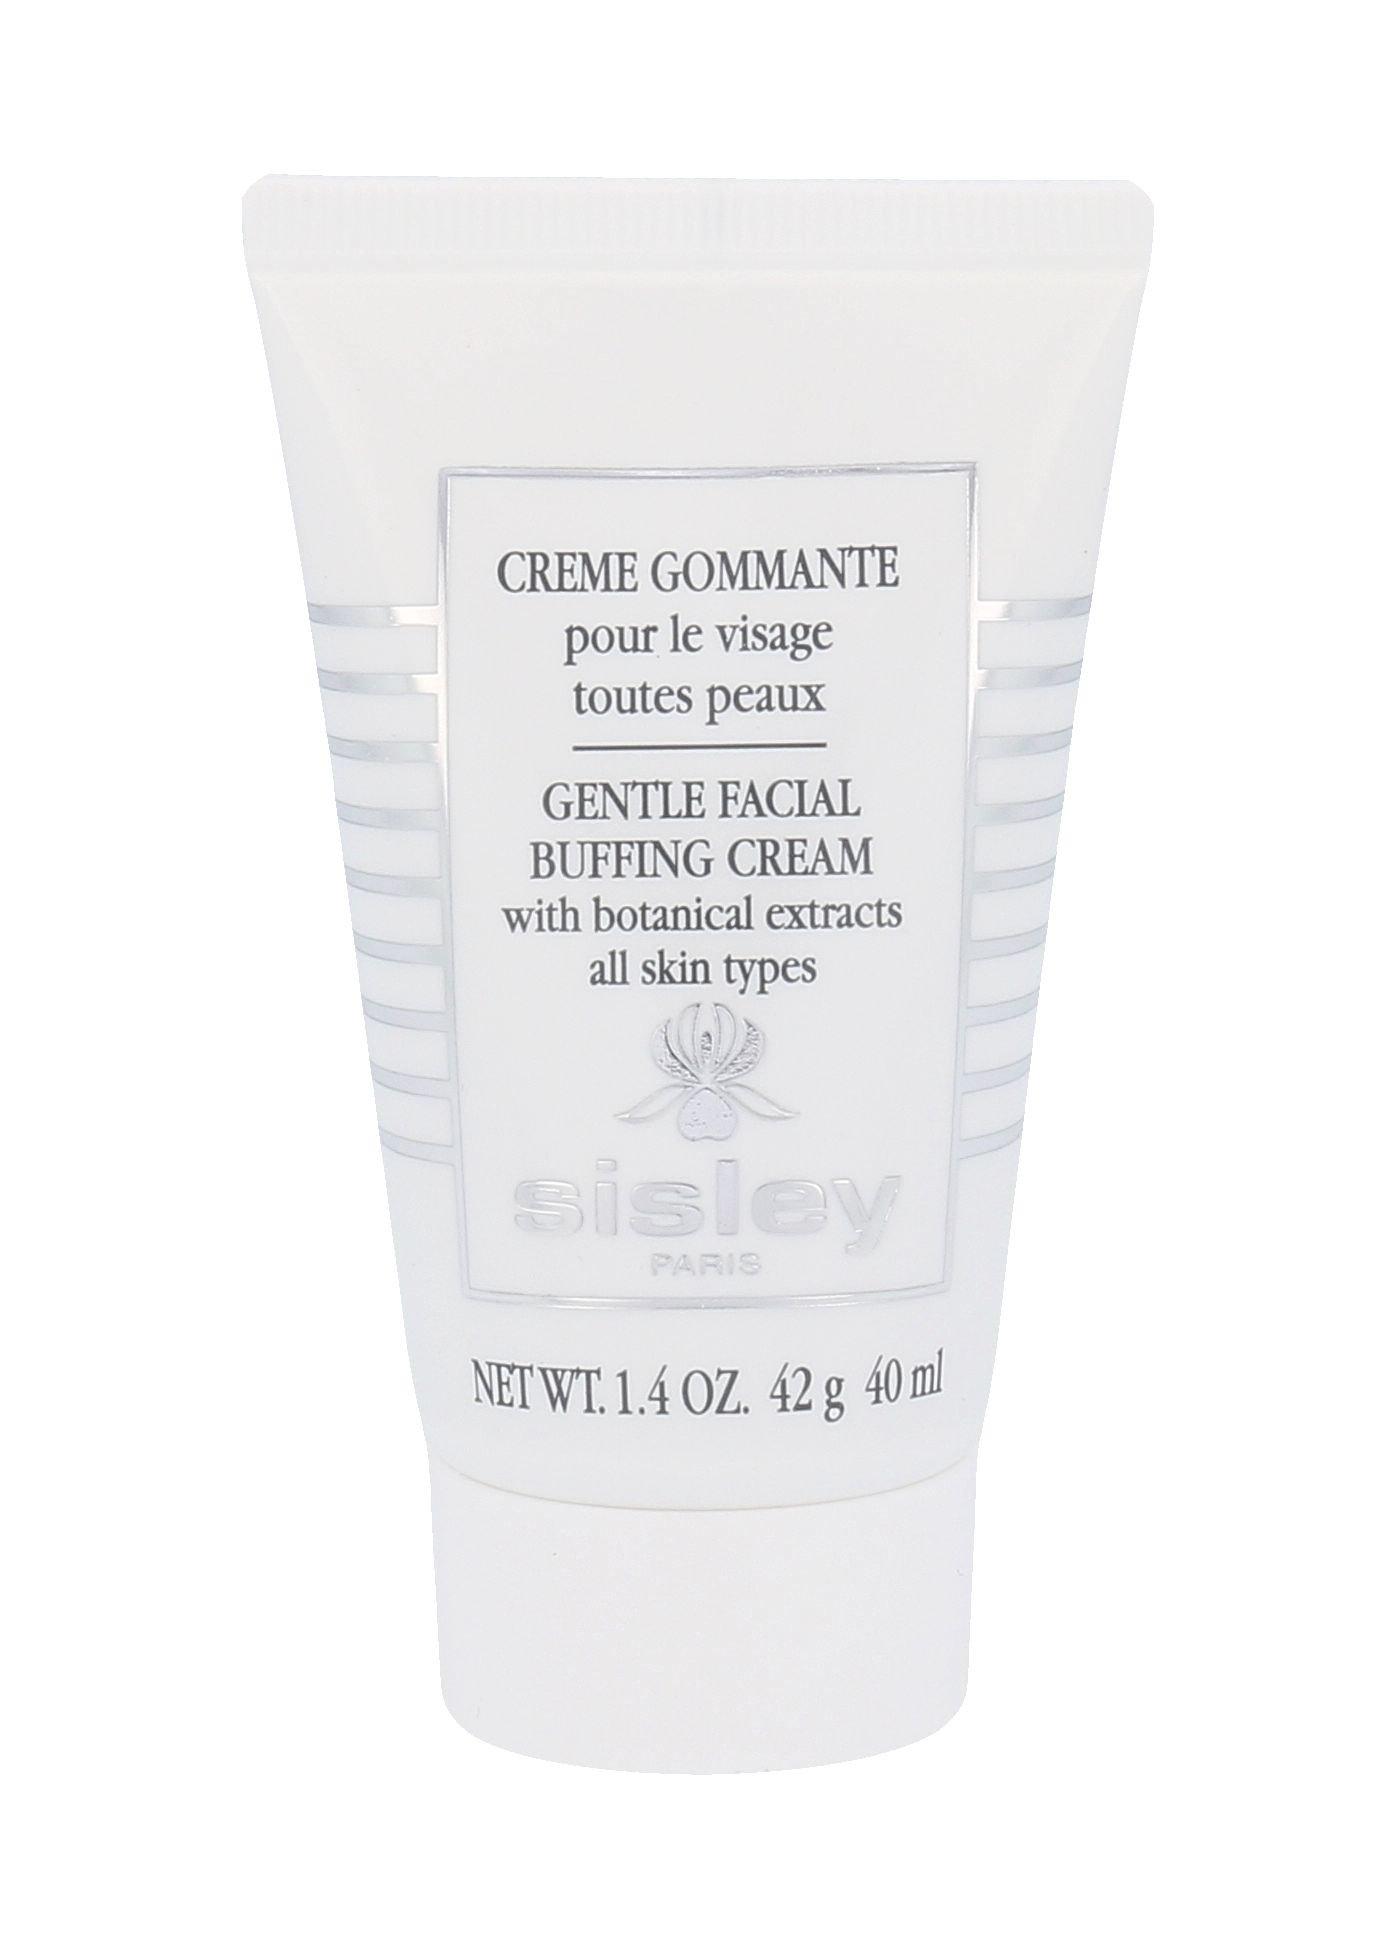 Sisley Gentle Facial Buffing Cream Cosmetic 40ml